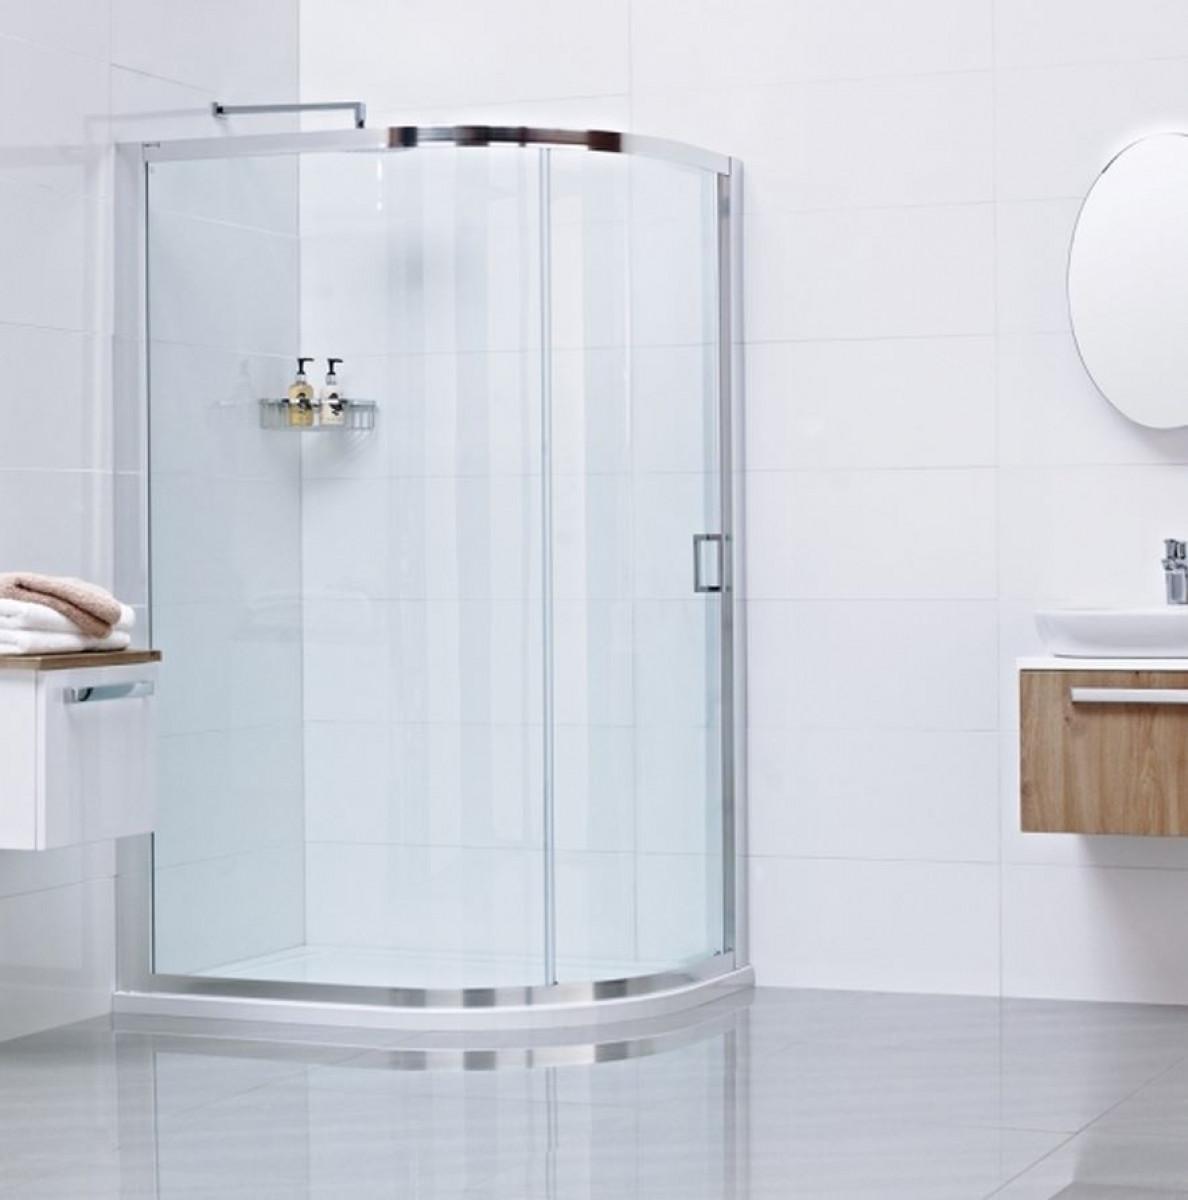 Roman Lumin8 One Door 800 X 900 Offset Quadrant Shower